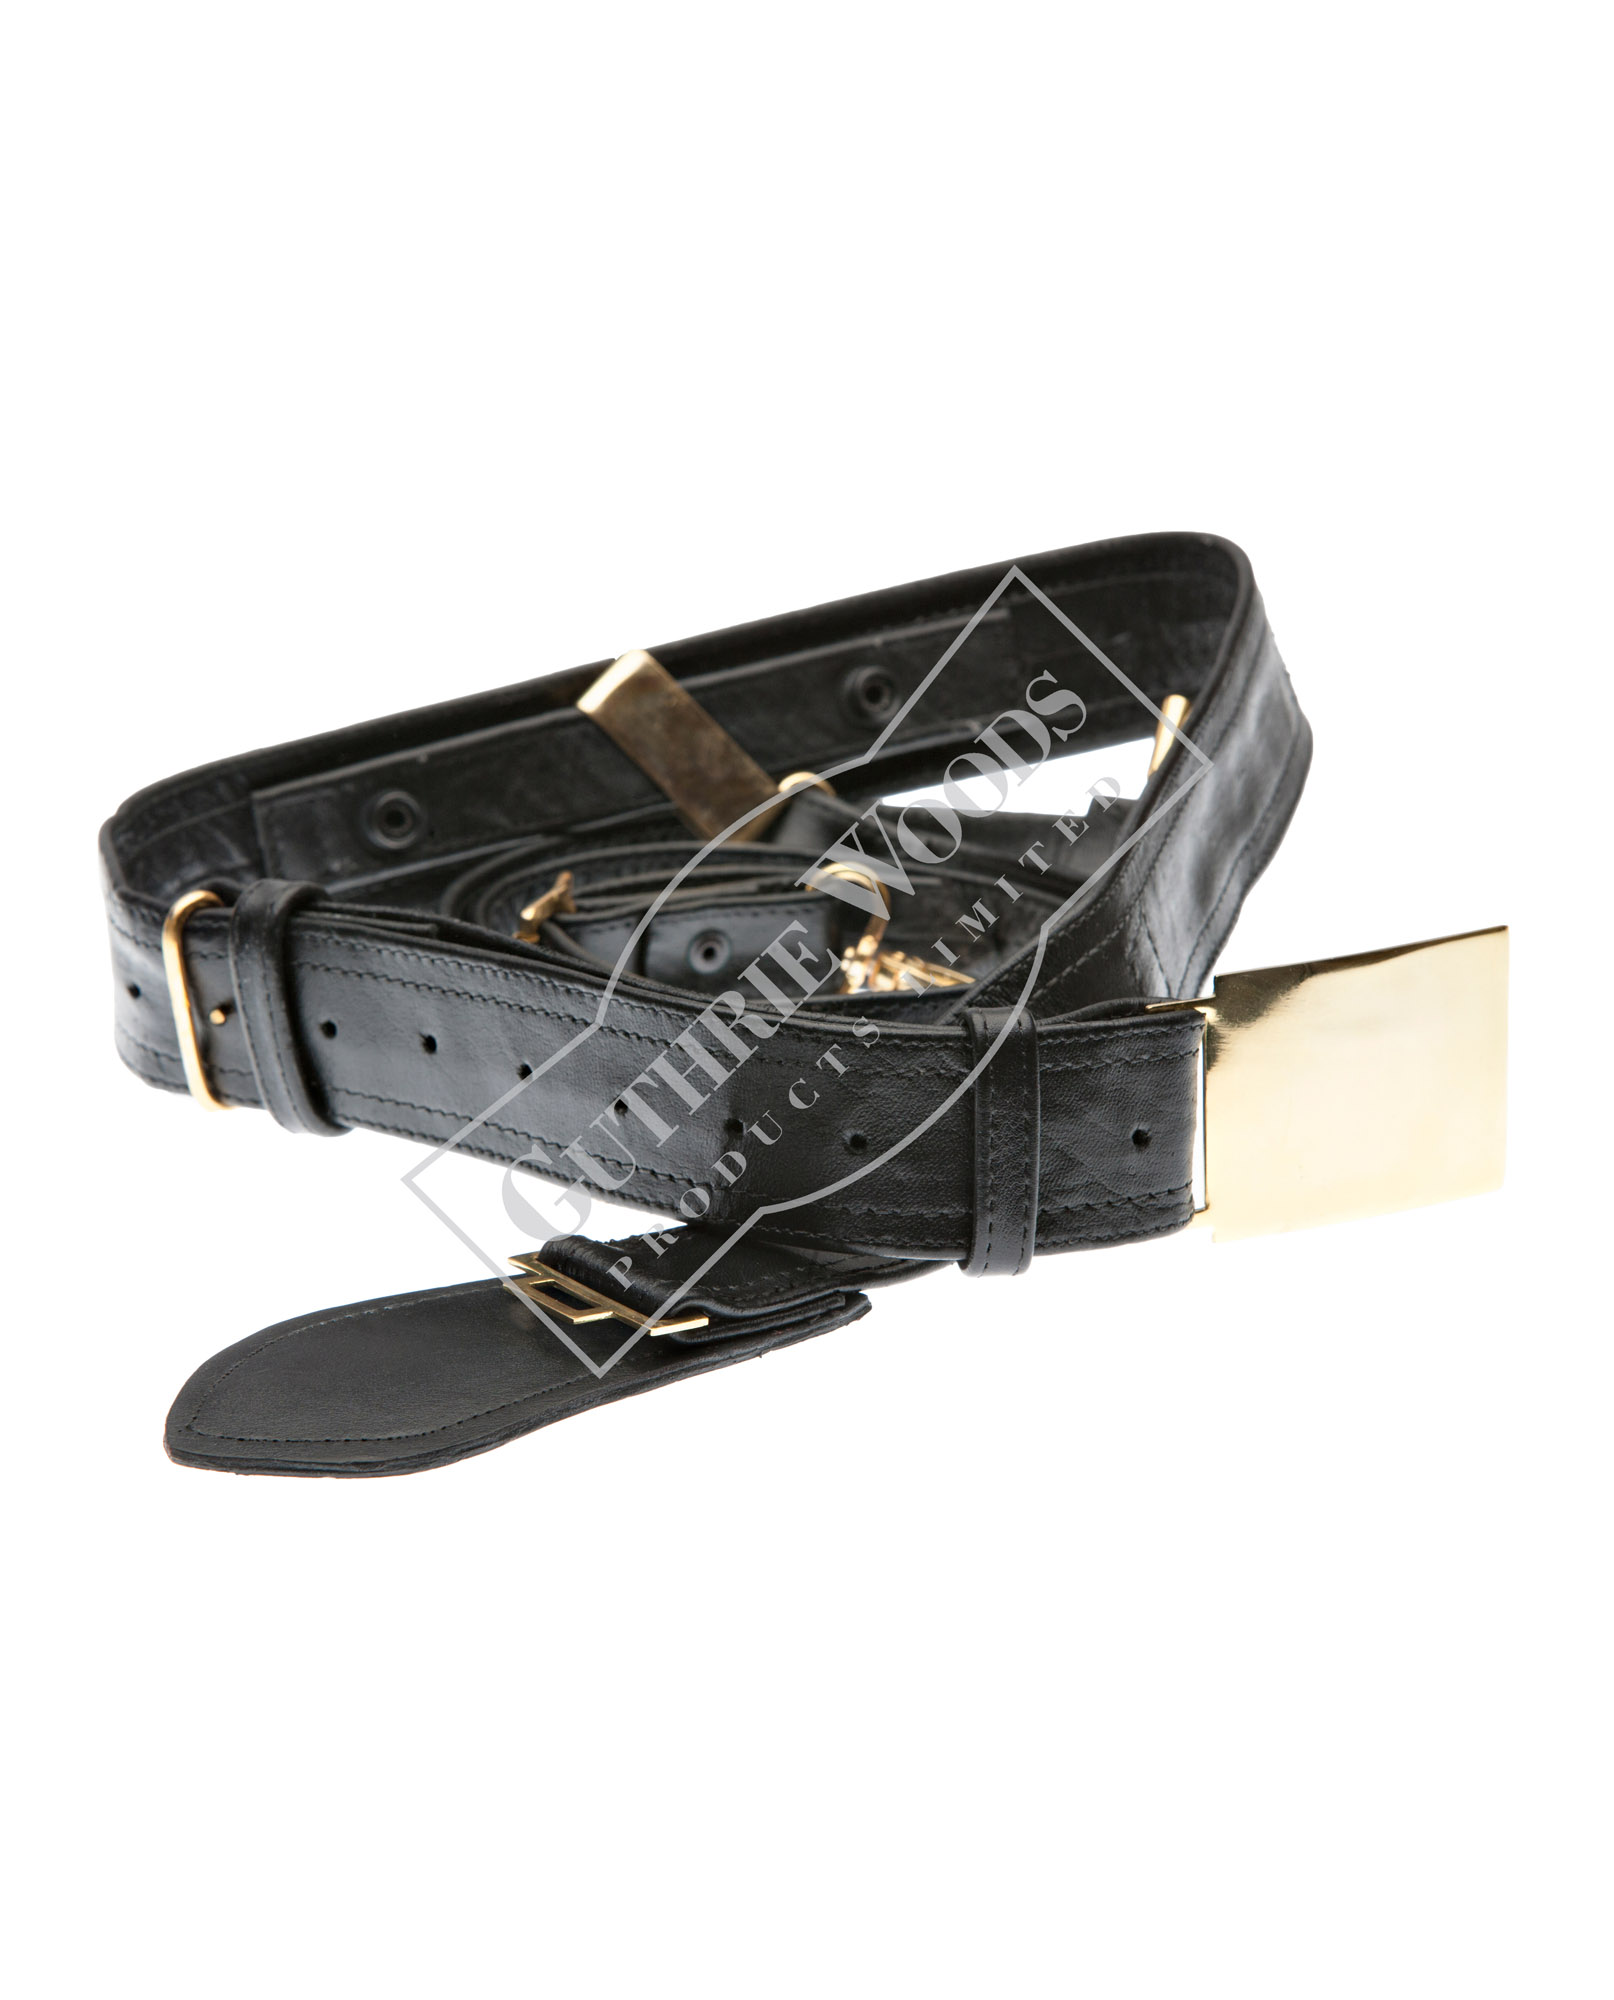 275-B6 - Sword Belt 2